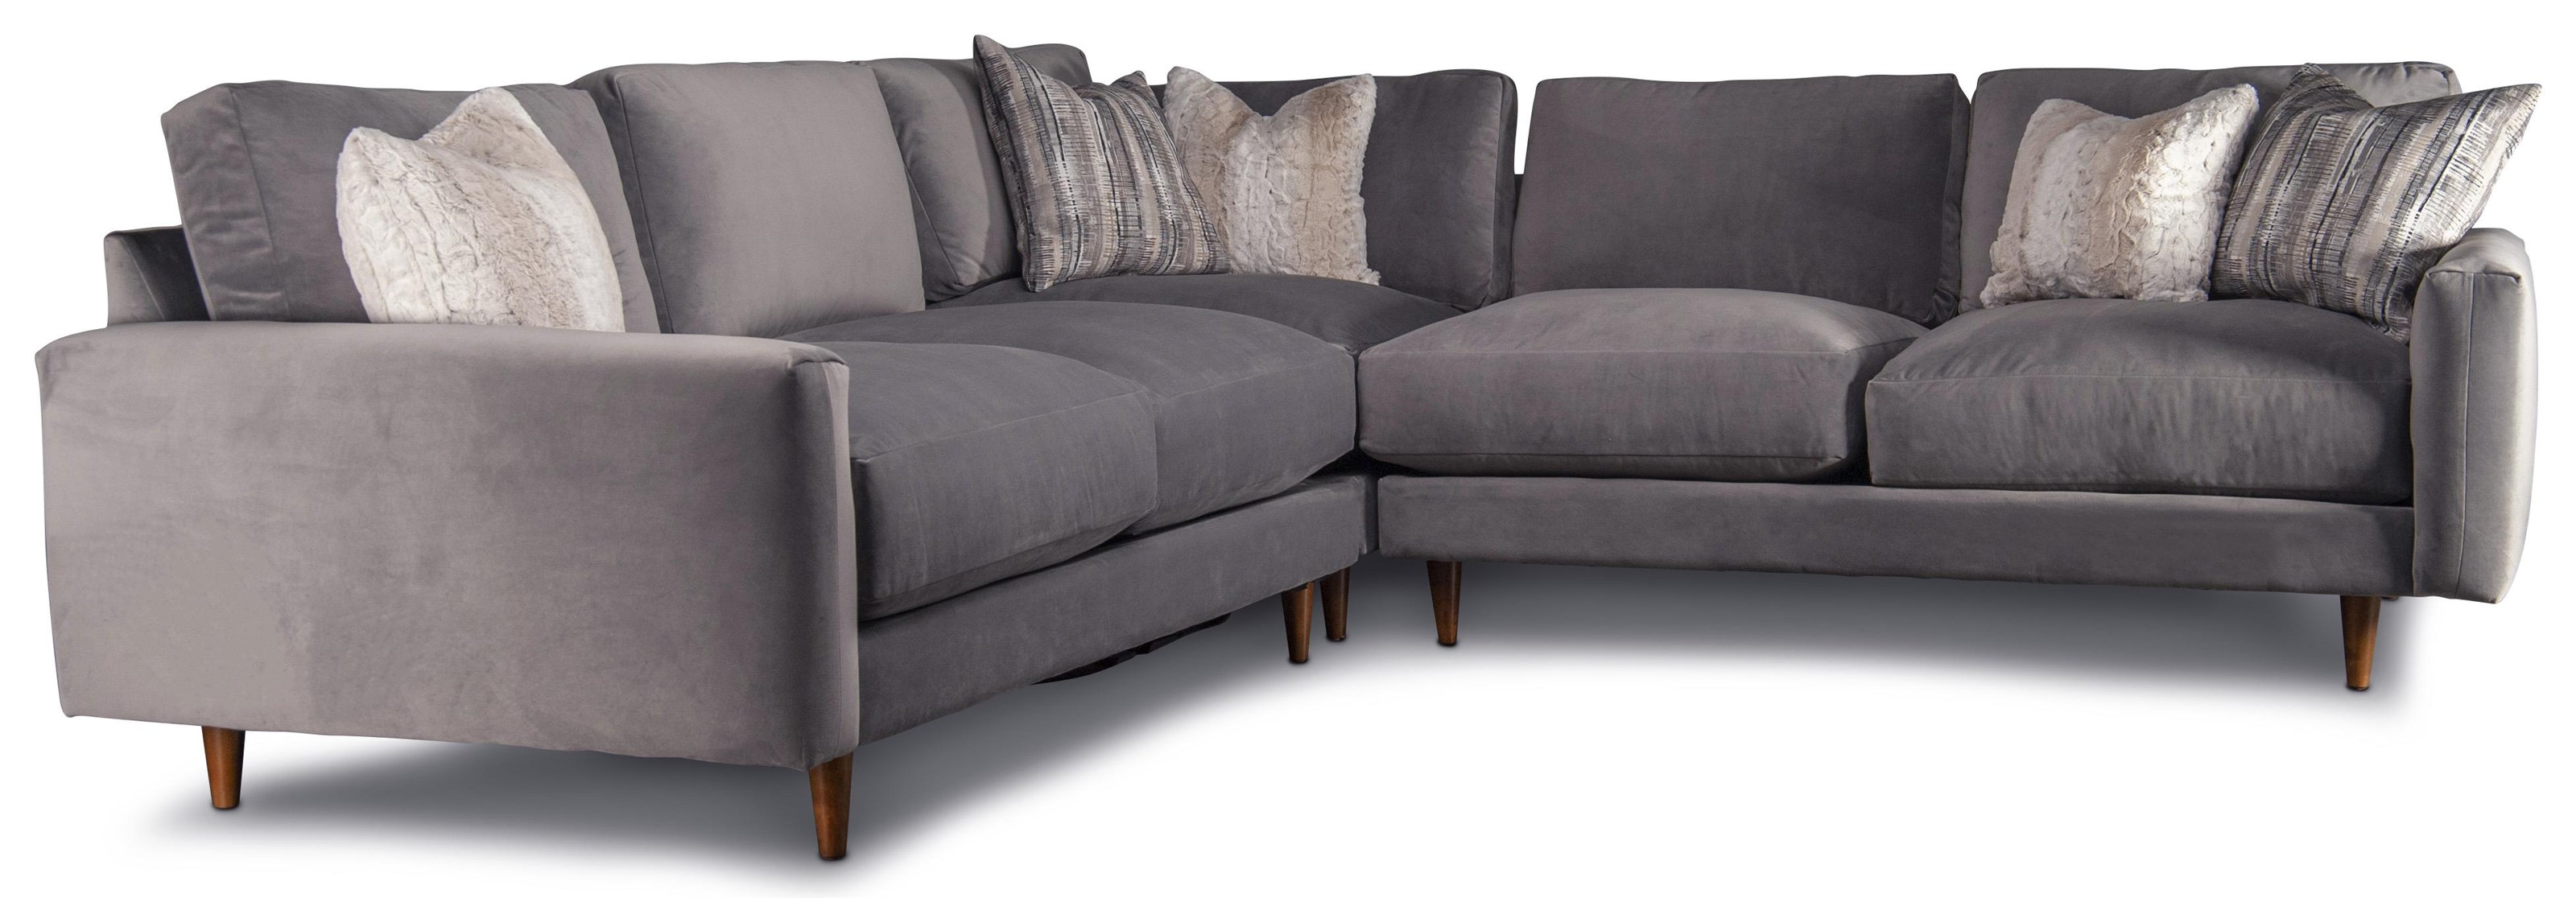 Rosalie Rosalie Sectional Sofa by Jonathan Louis at Morris Home